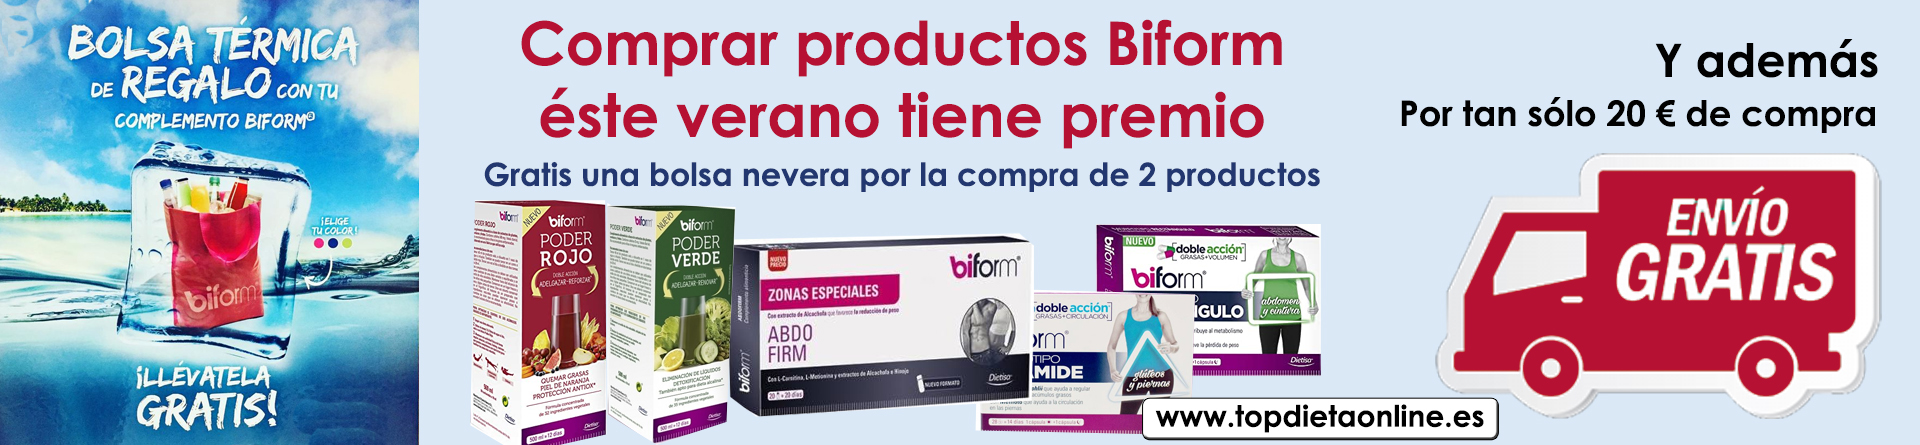 Nevera productos biform